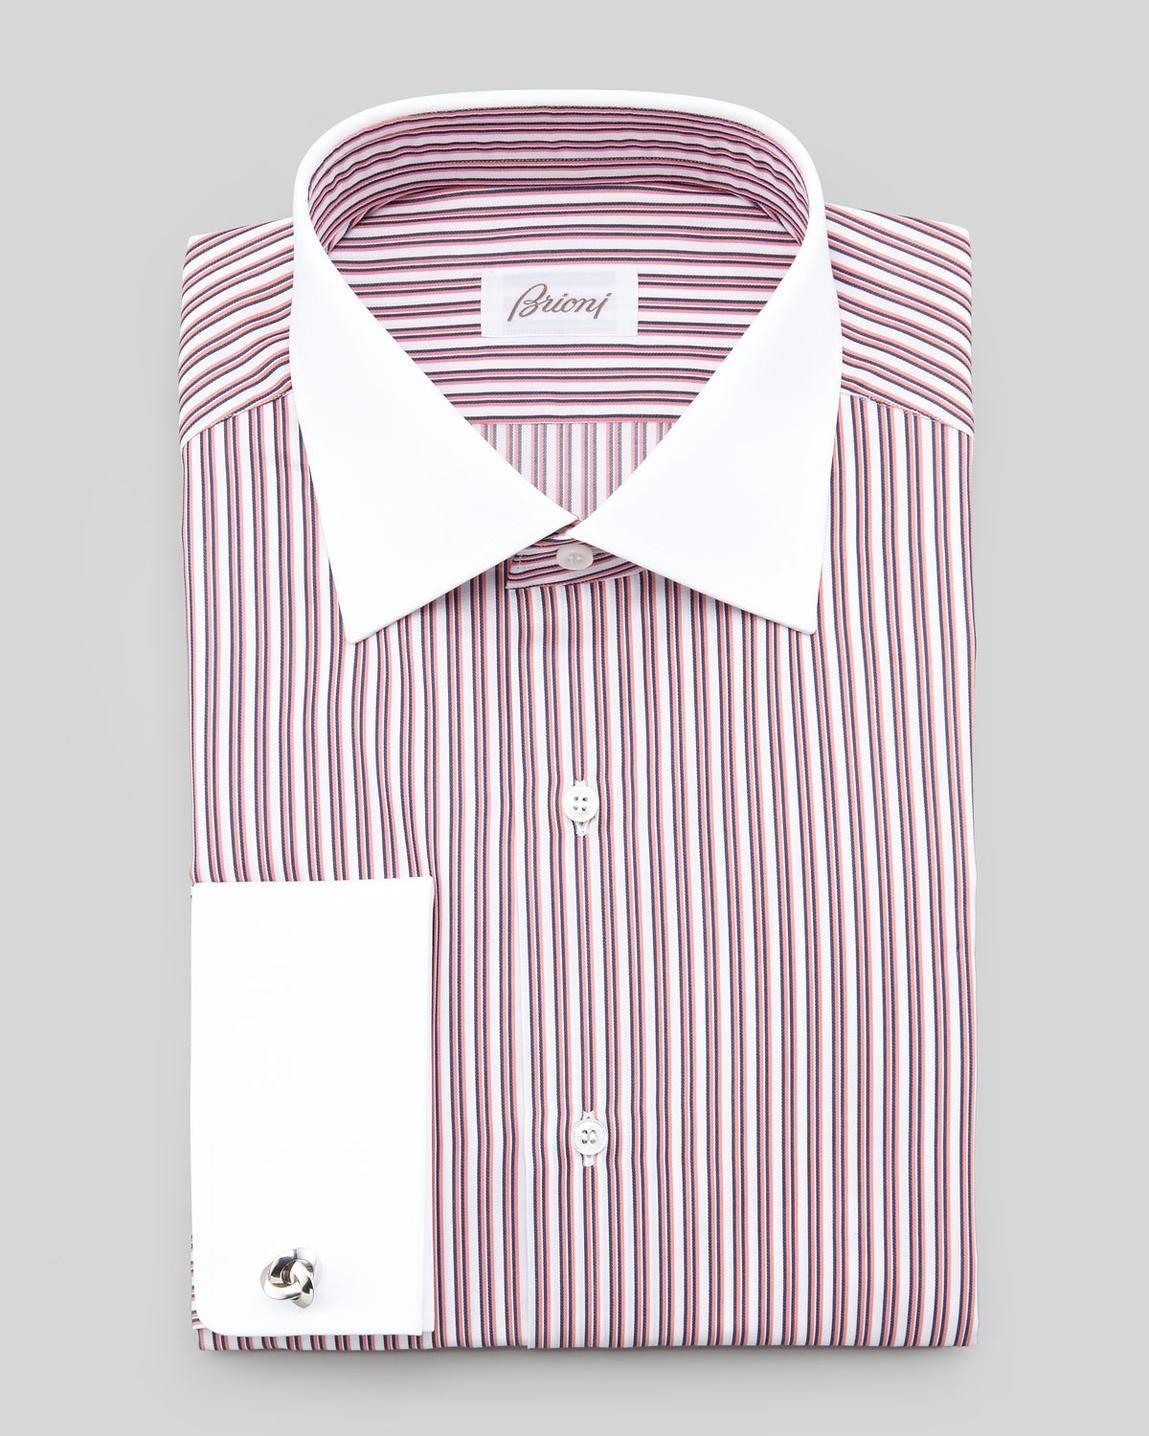 54a65af1ccd3 brioni dress shirt - Google Search